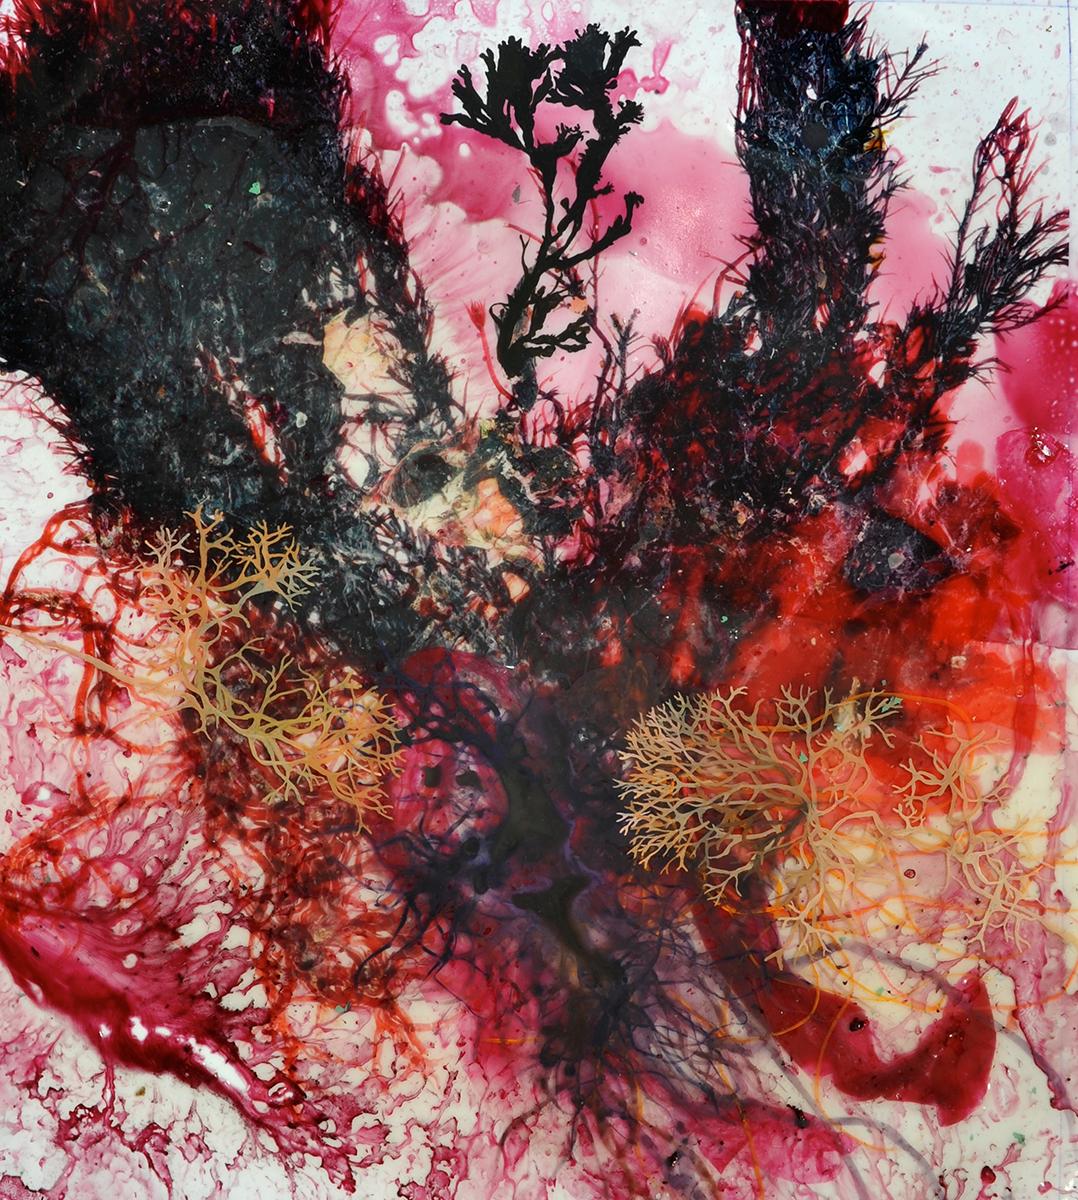 Michael Porter Seaweed 01-12-15